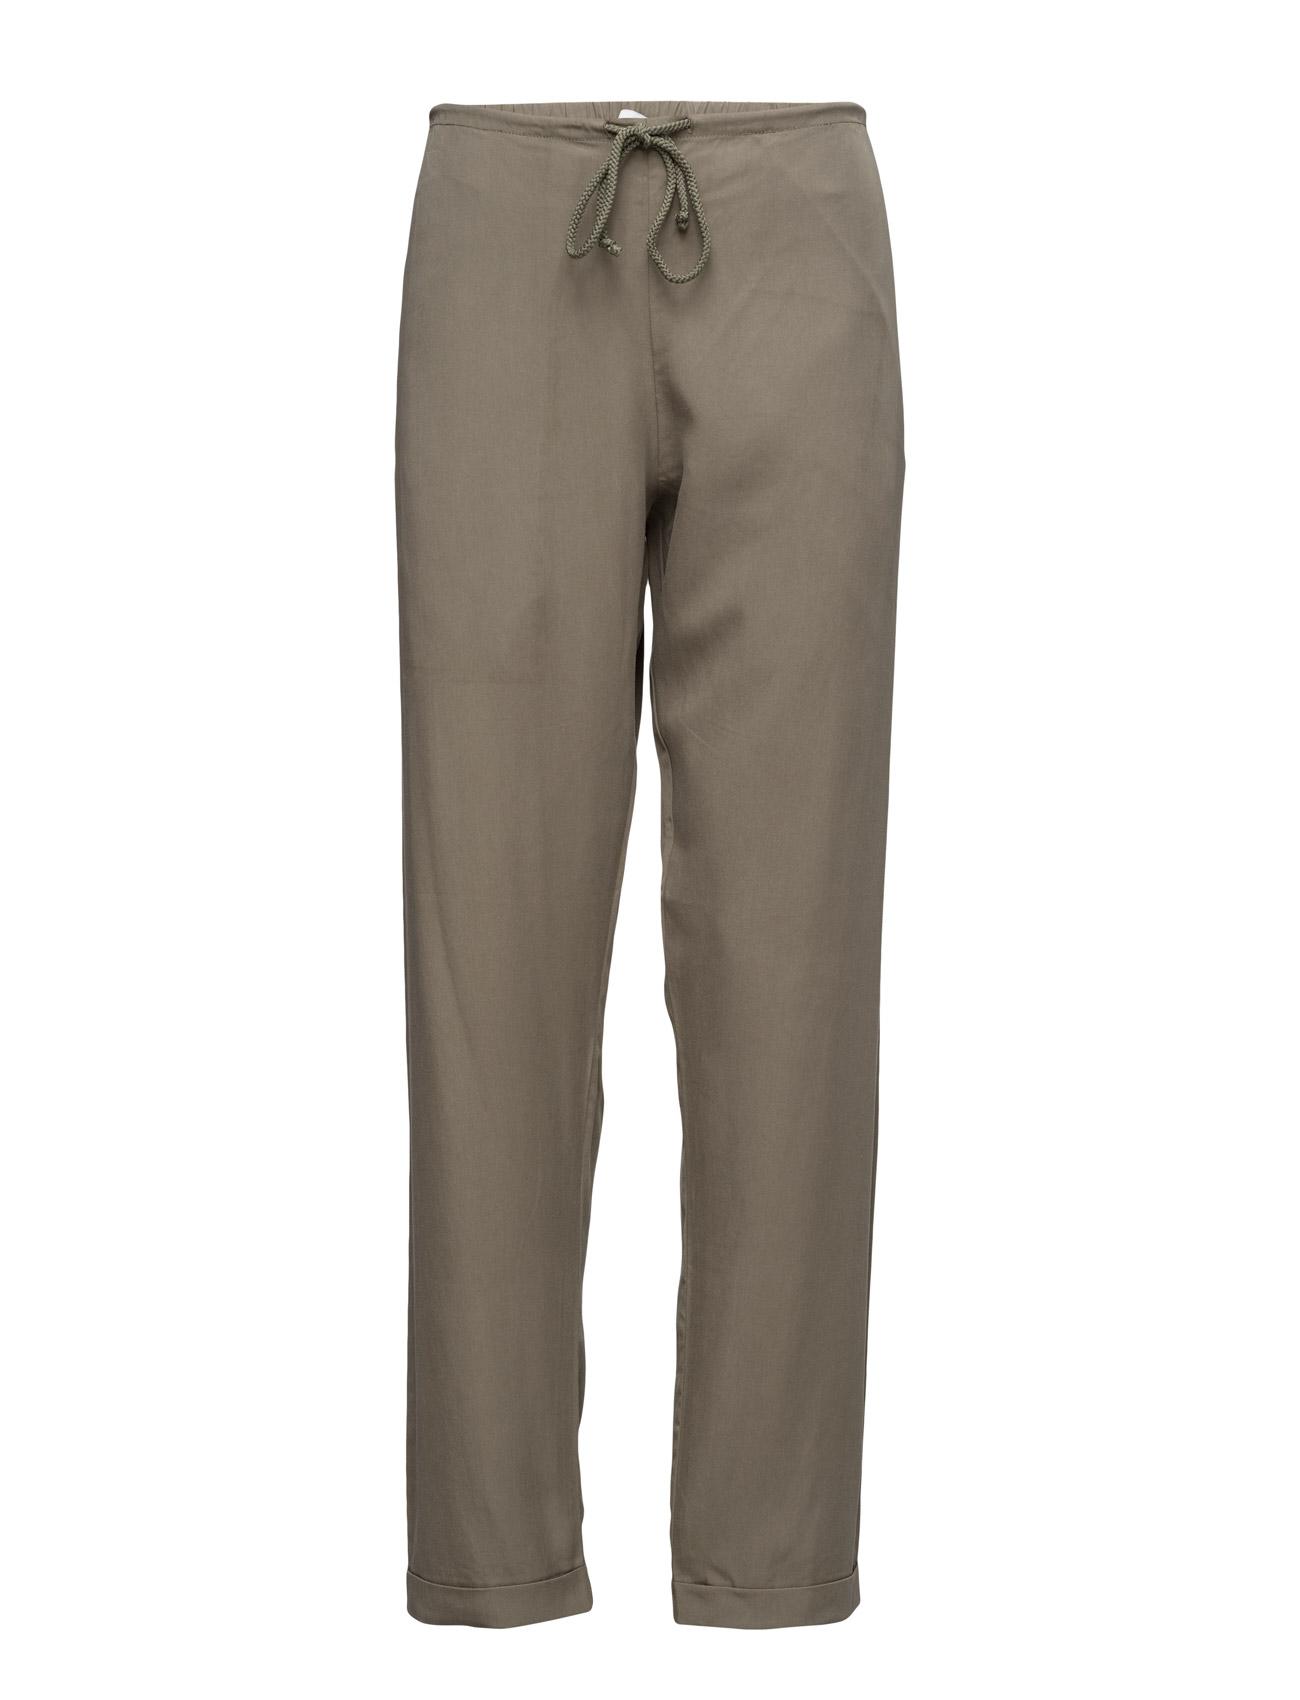 7500 - Seda Narrow The Lab Bukser til Kvinder i khaki